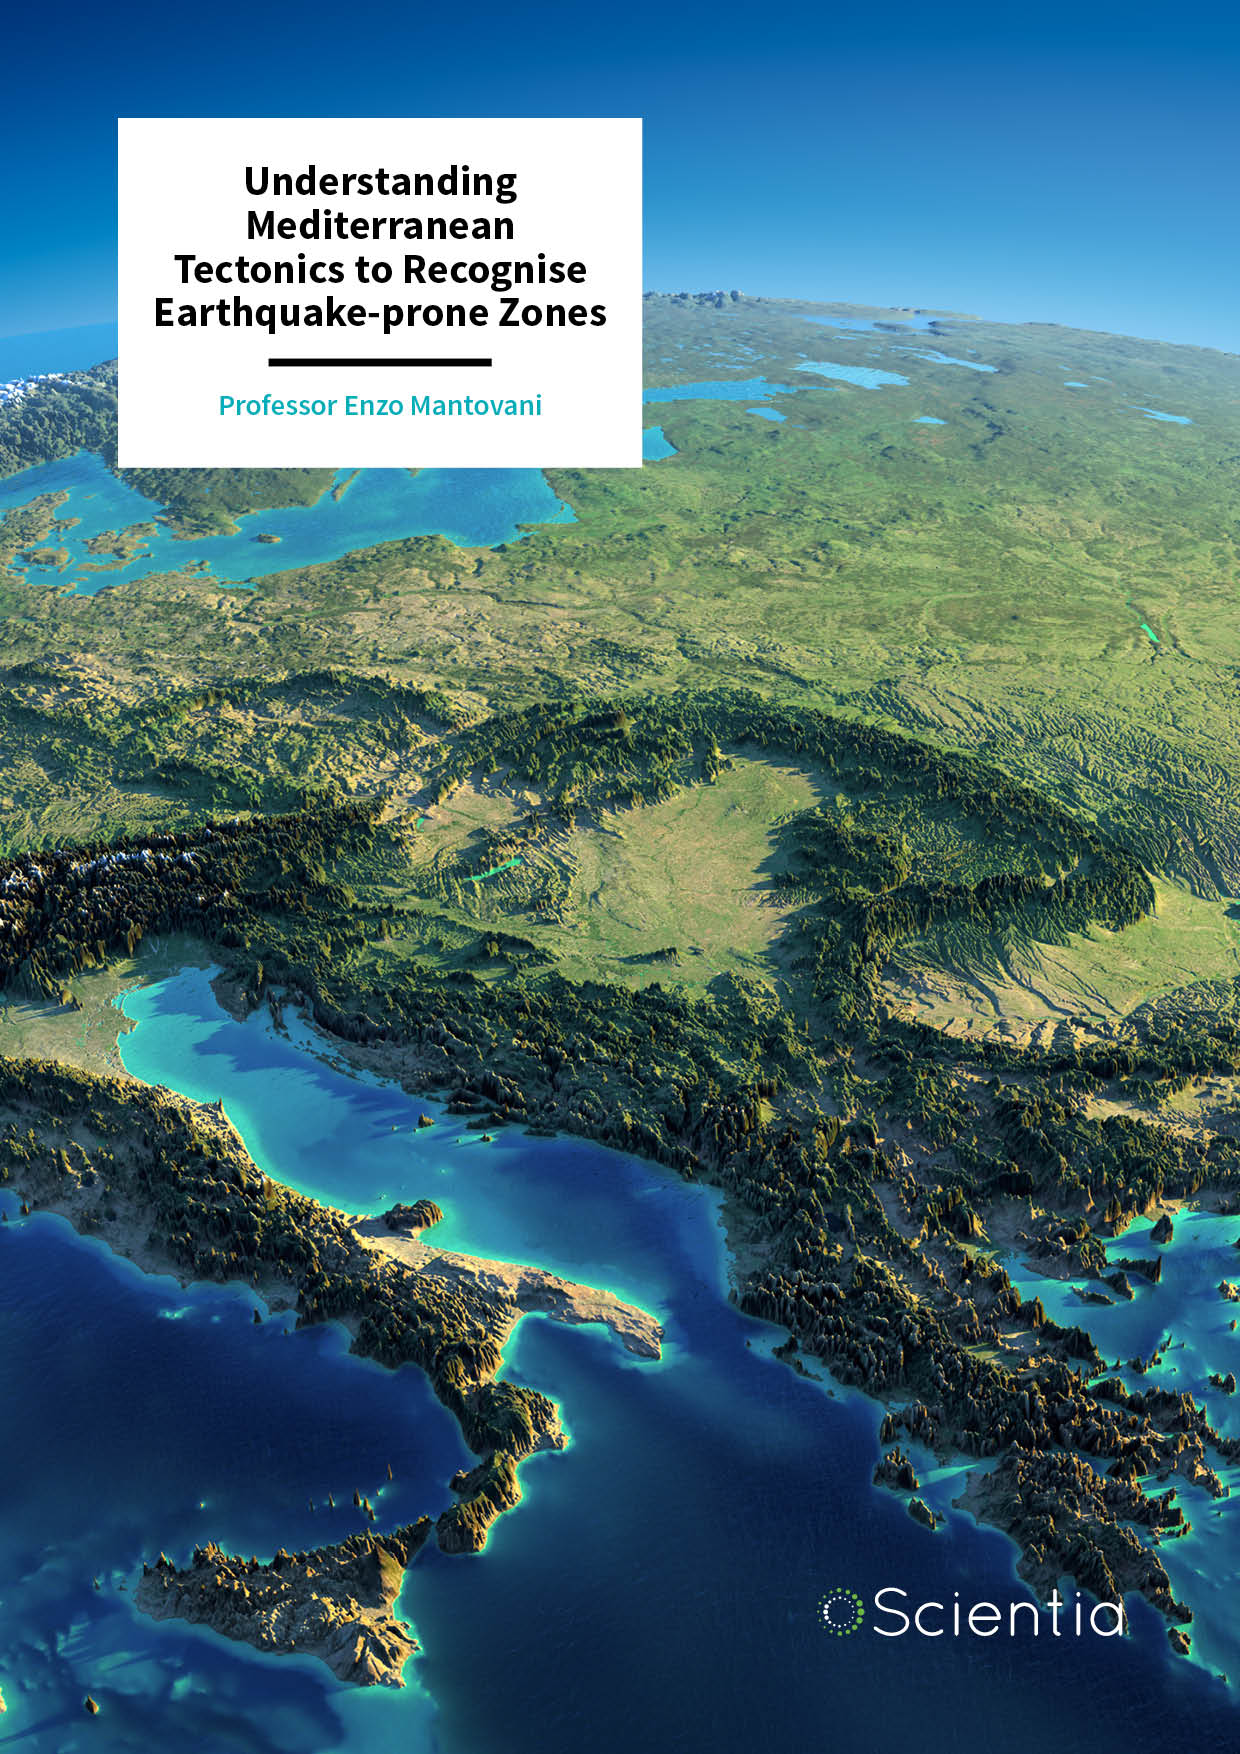 Professor Enzo Mantovani – Understanding Mediterranean Tectonics to Recognise Earthquake-prone Zones